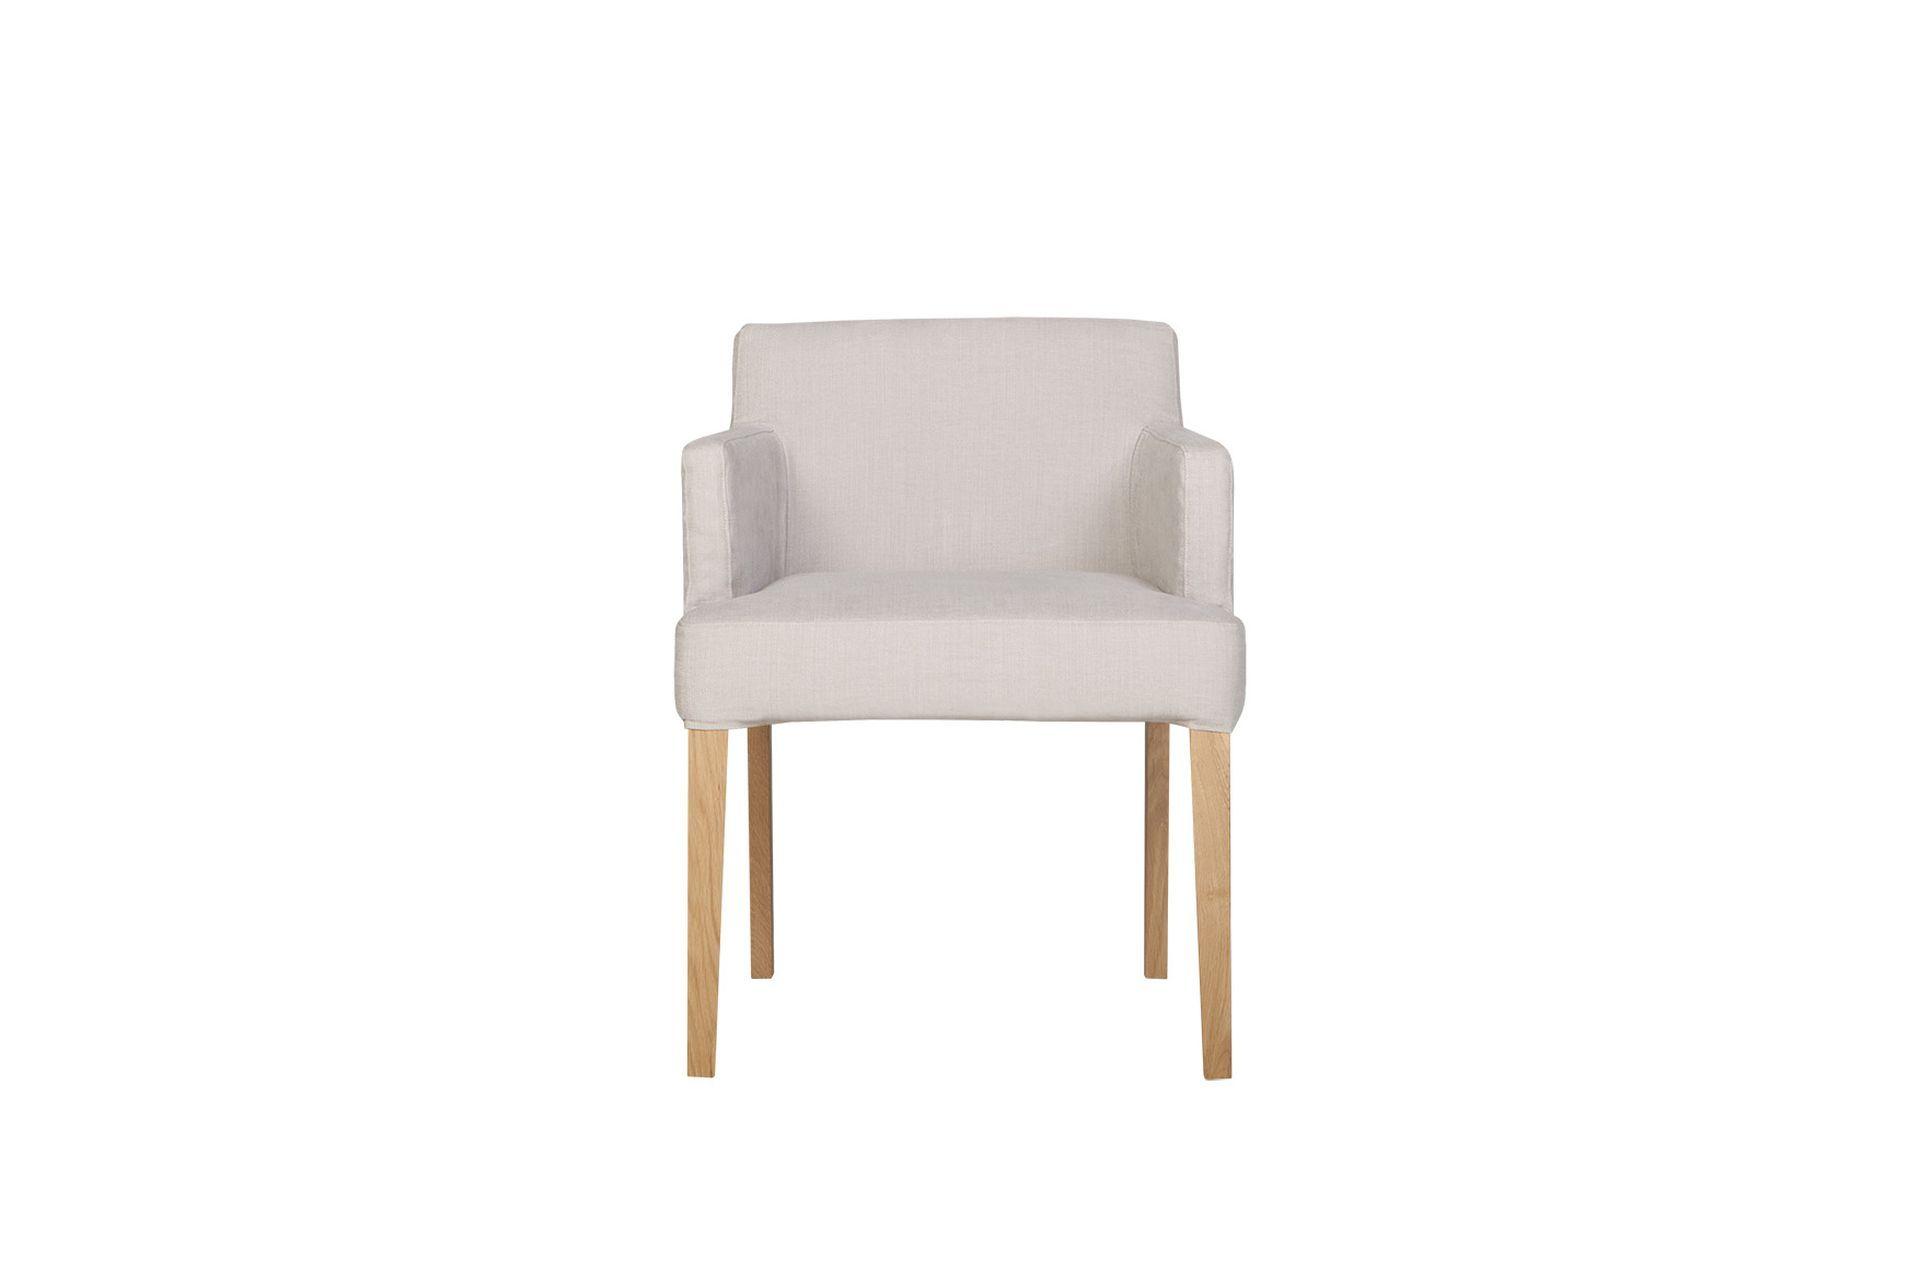 Кресло linn (sits) серый 57x74x57 см.